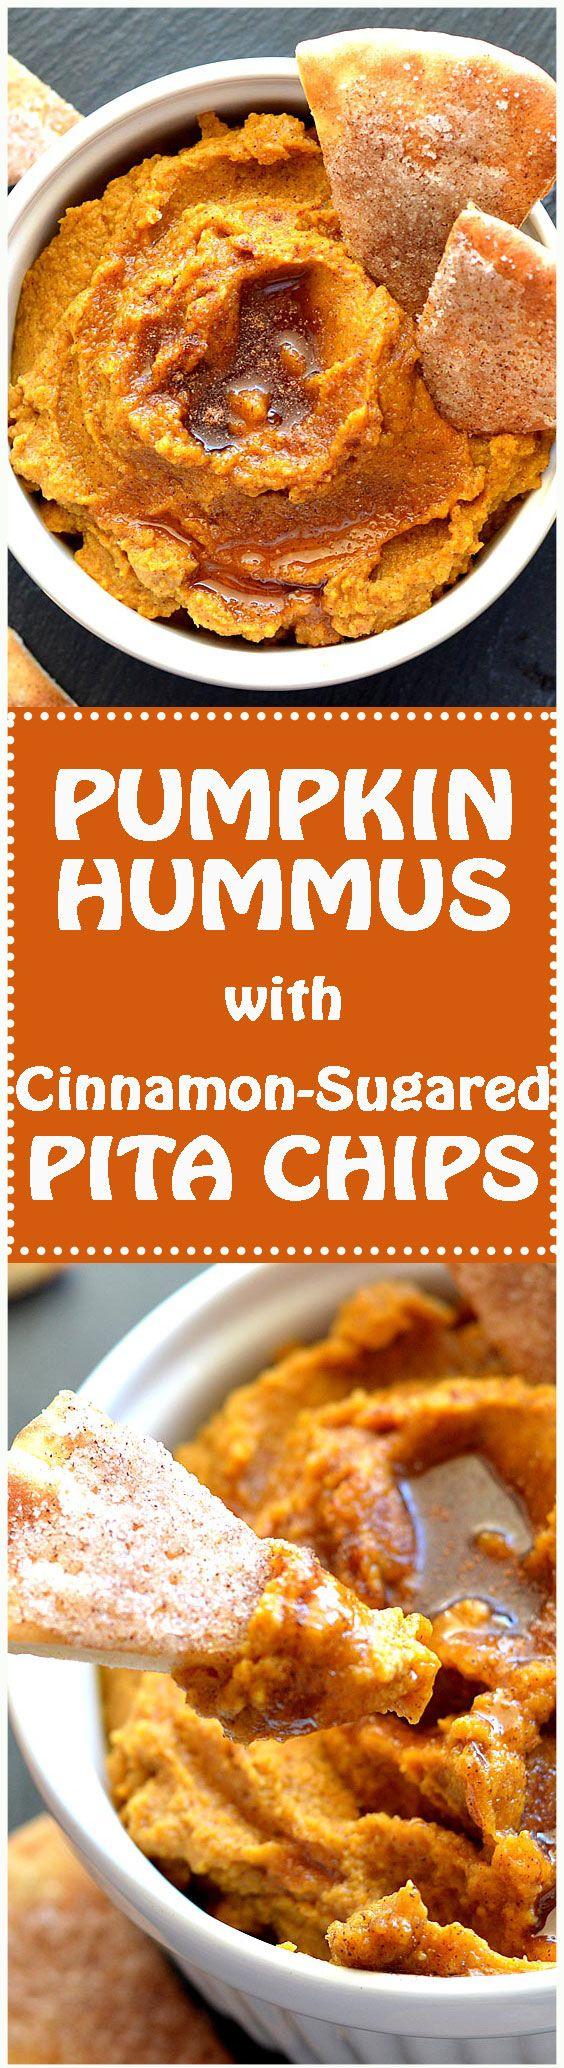 Pumpkin Hummus with Cinnamon Sugared Pita Chips